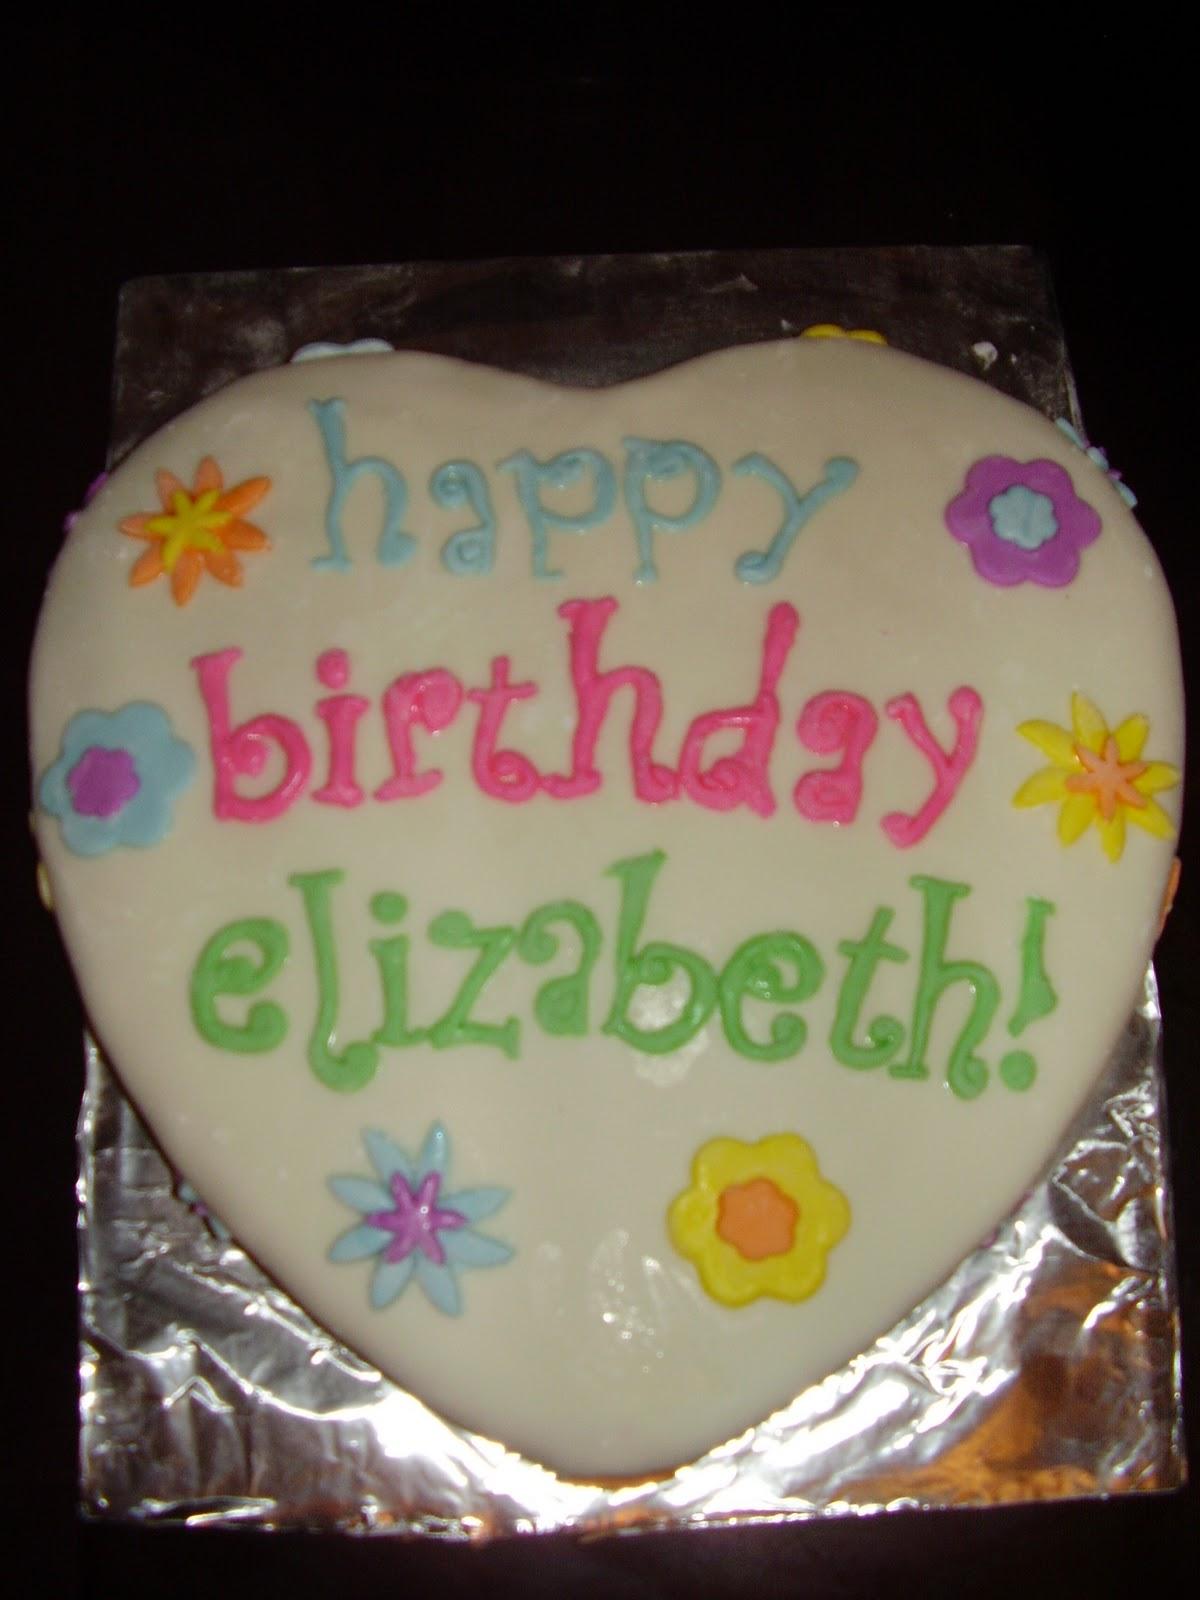 Happy Birthday to Elizabeth - BIRTHDAY GREETINGS - THE ...